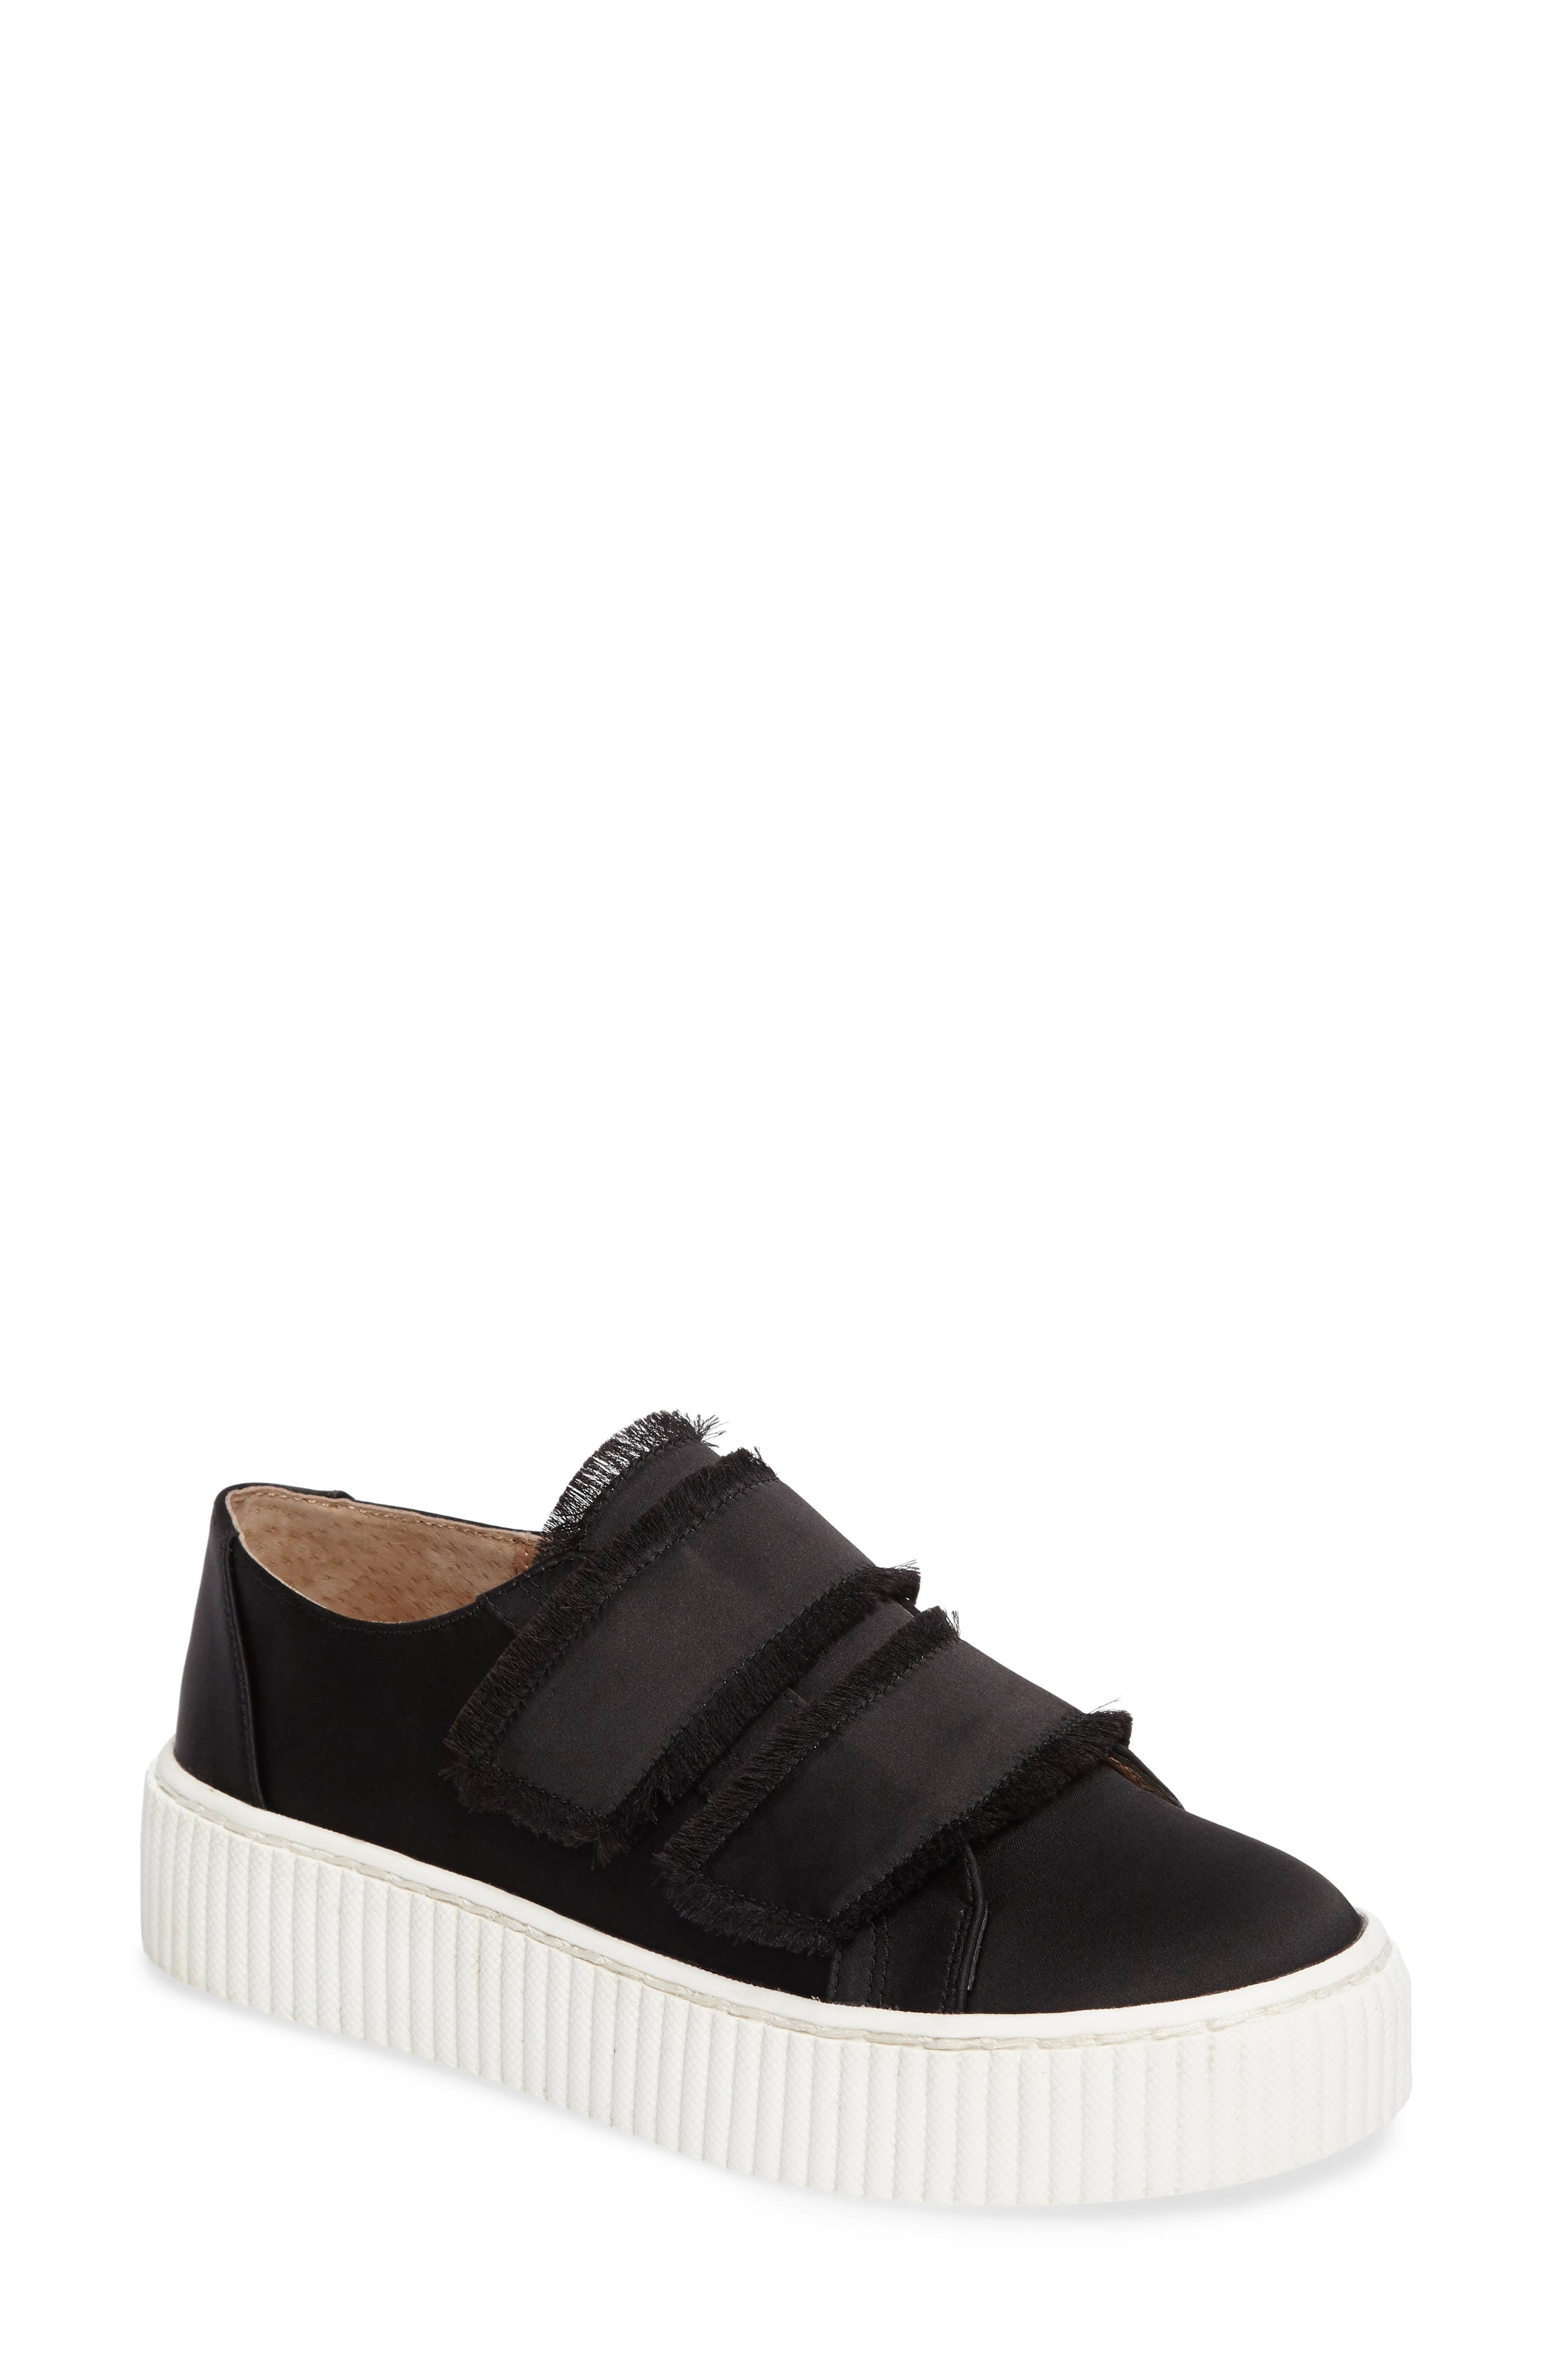 Main Image - Shellys London Elder Fringed Platform Sneaker (Women)